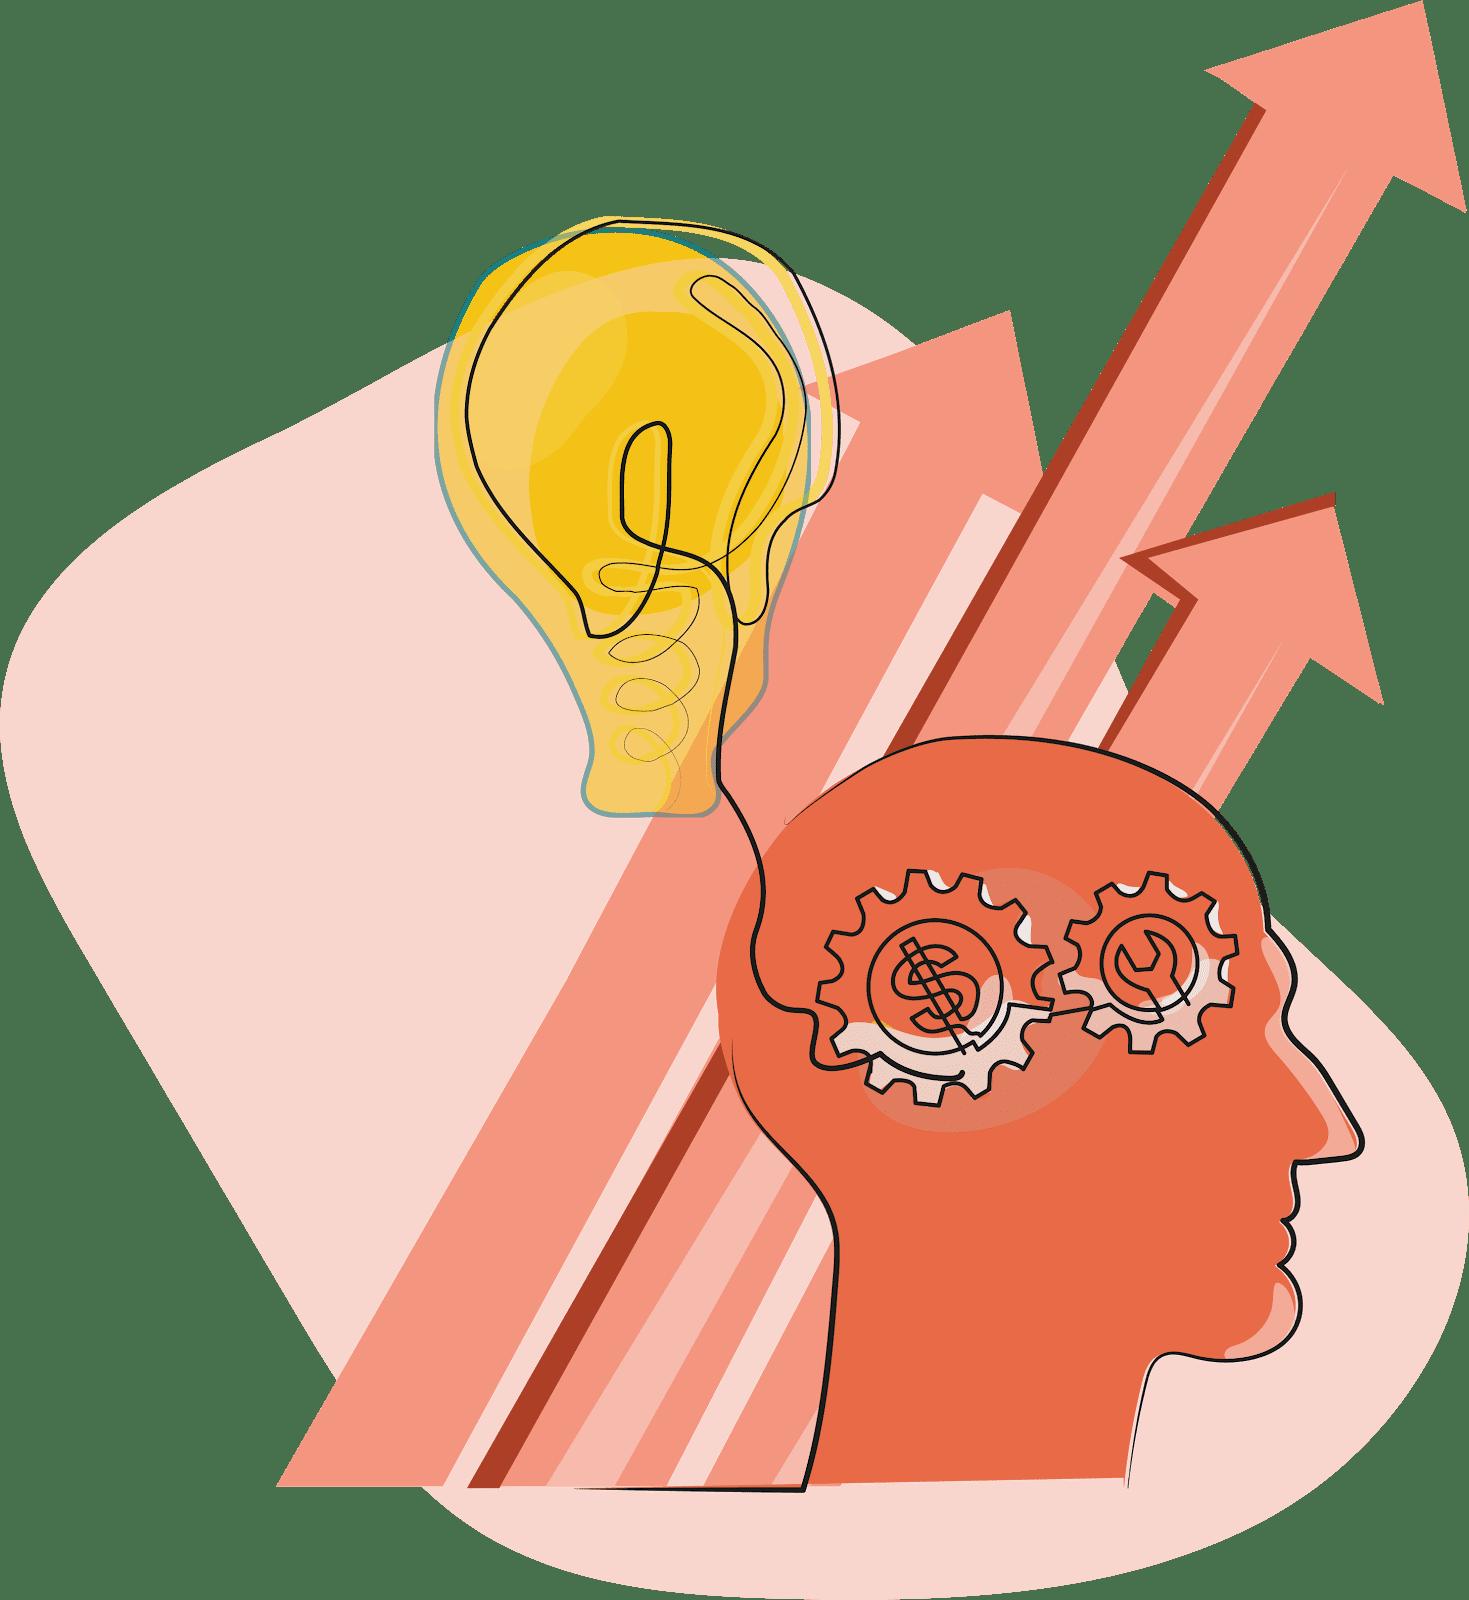 Portfolio careers can help you think like a CEO